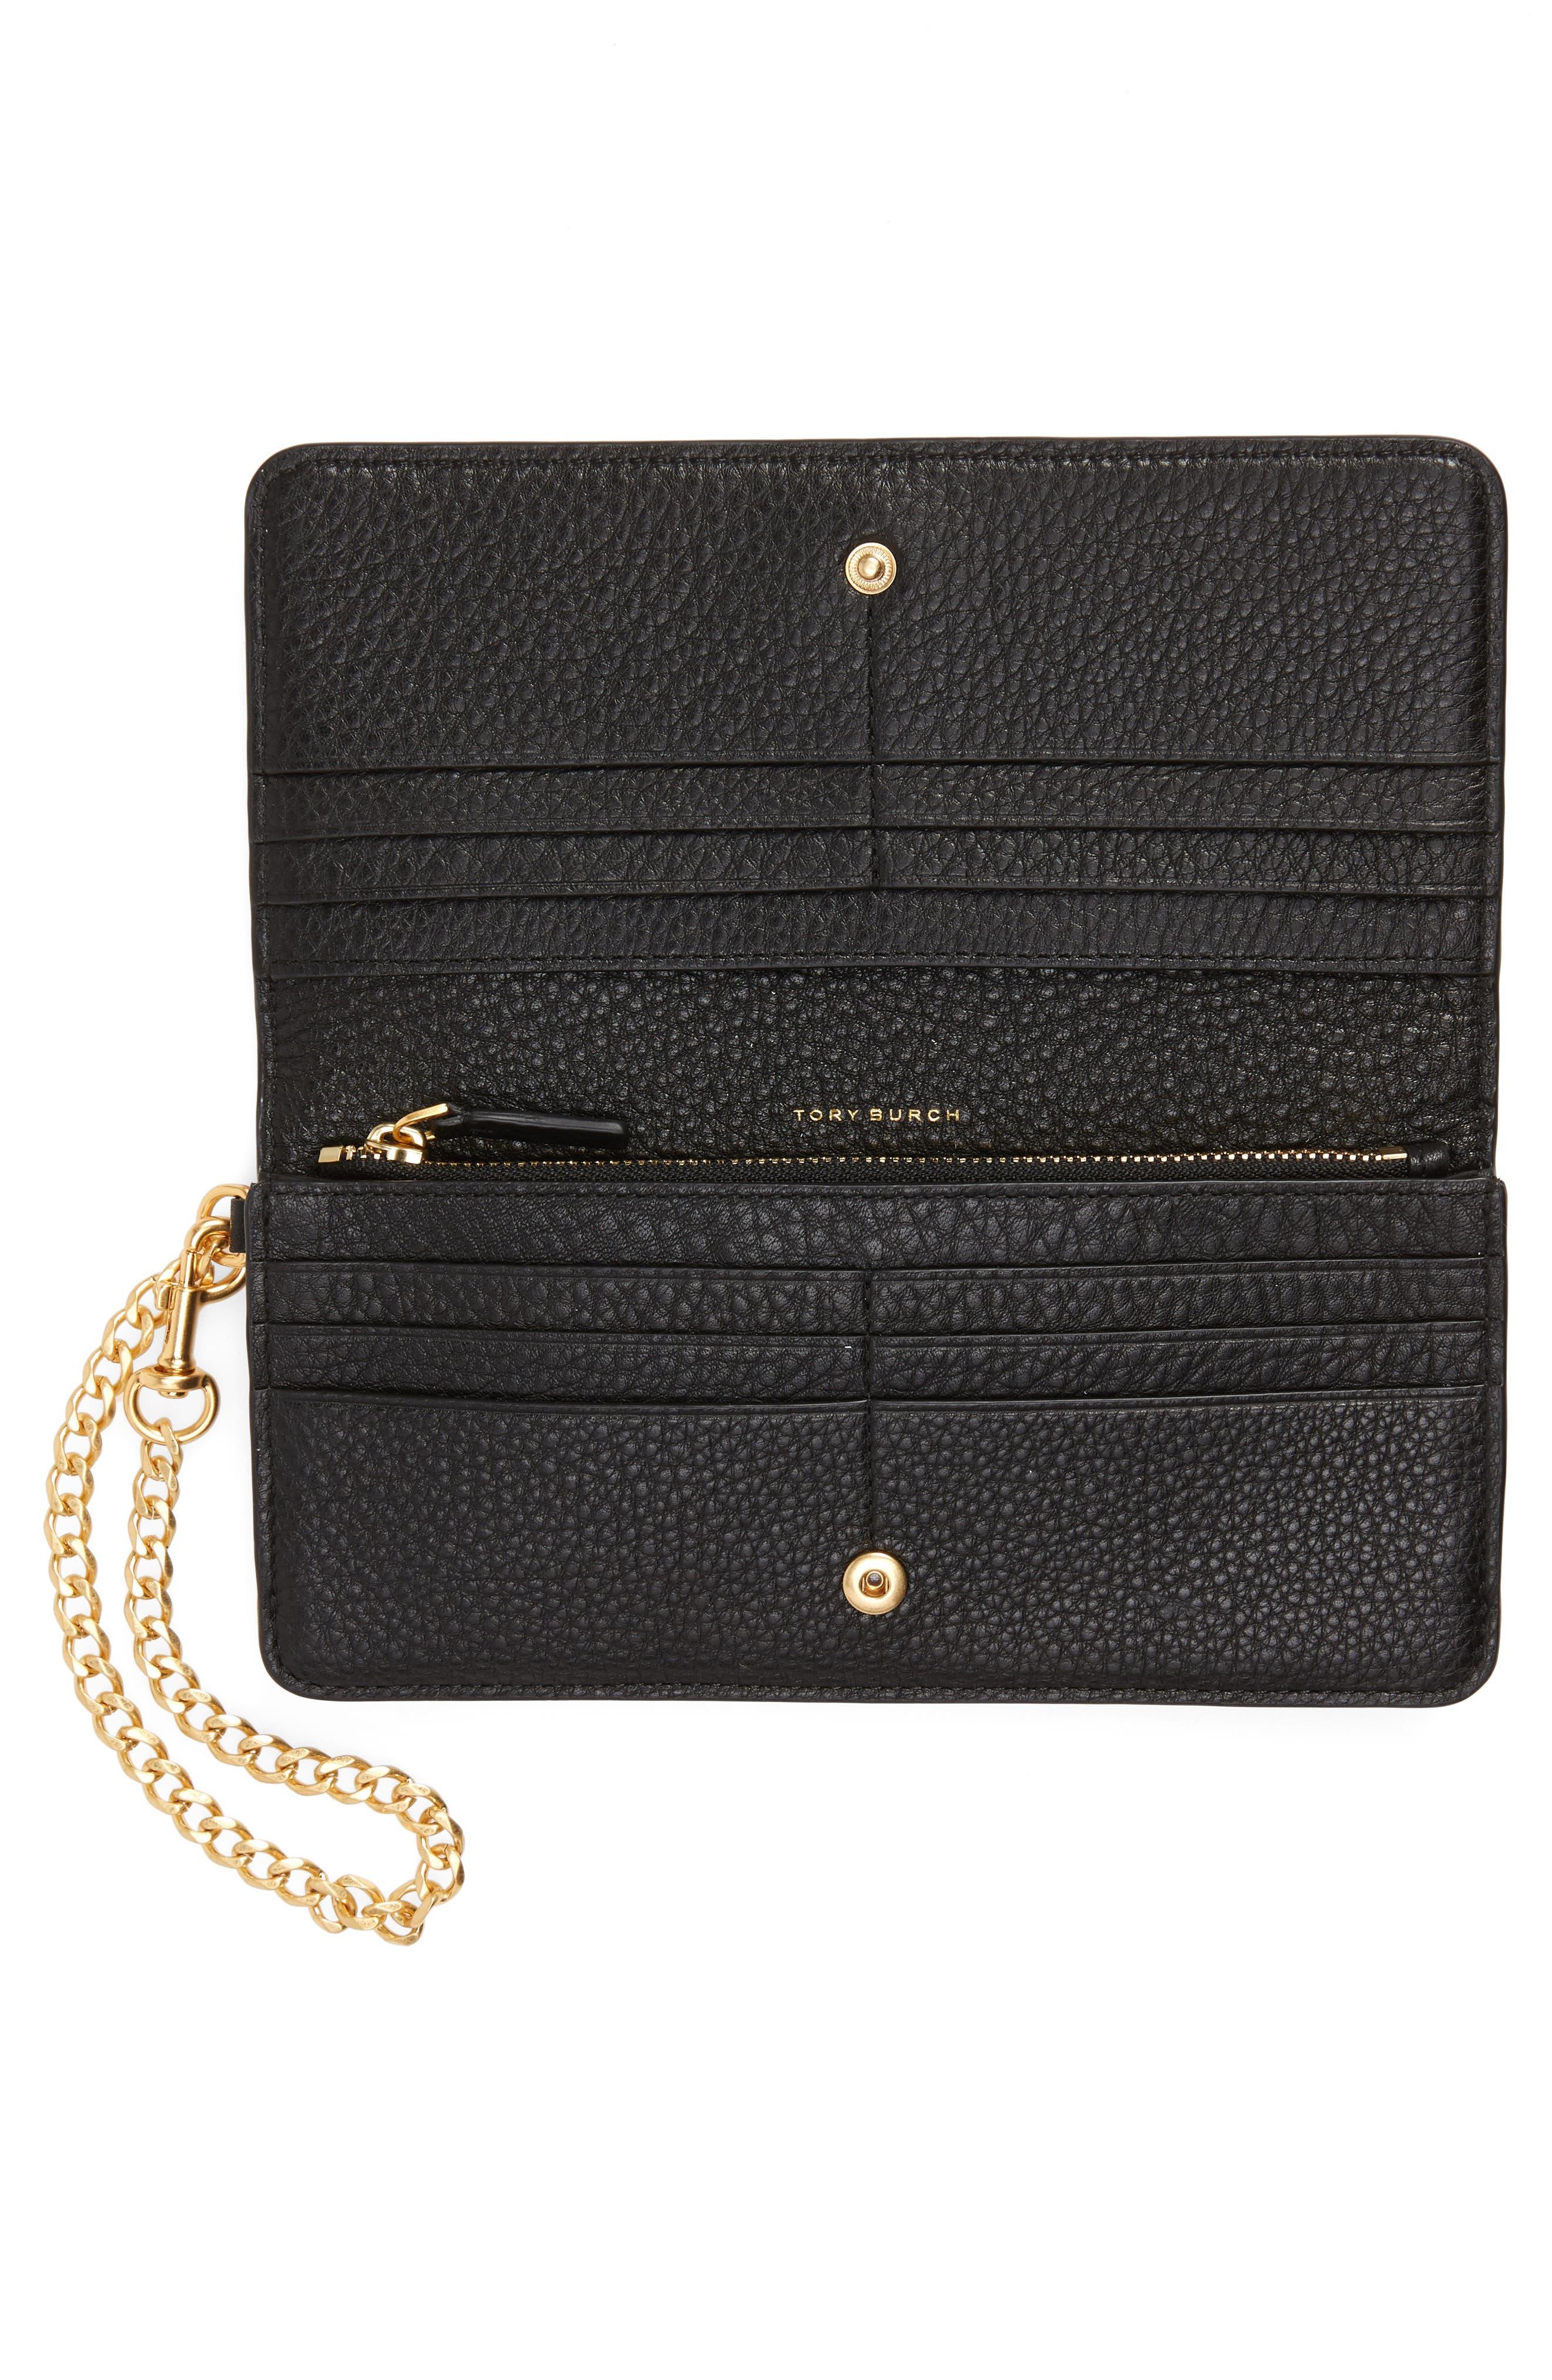 TORY BURCH, Chelsea Leather Wristlet Wallet, Alternate thumbnail 2, color, 001